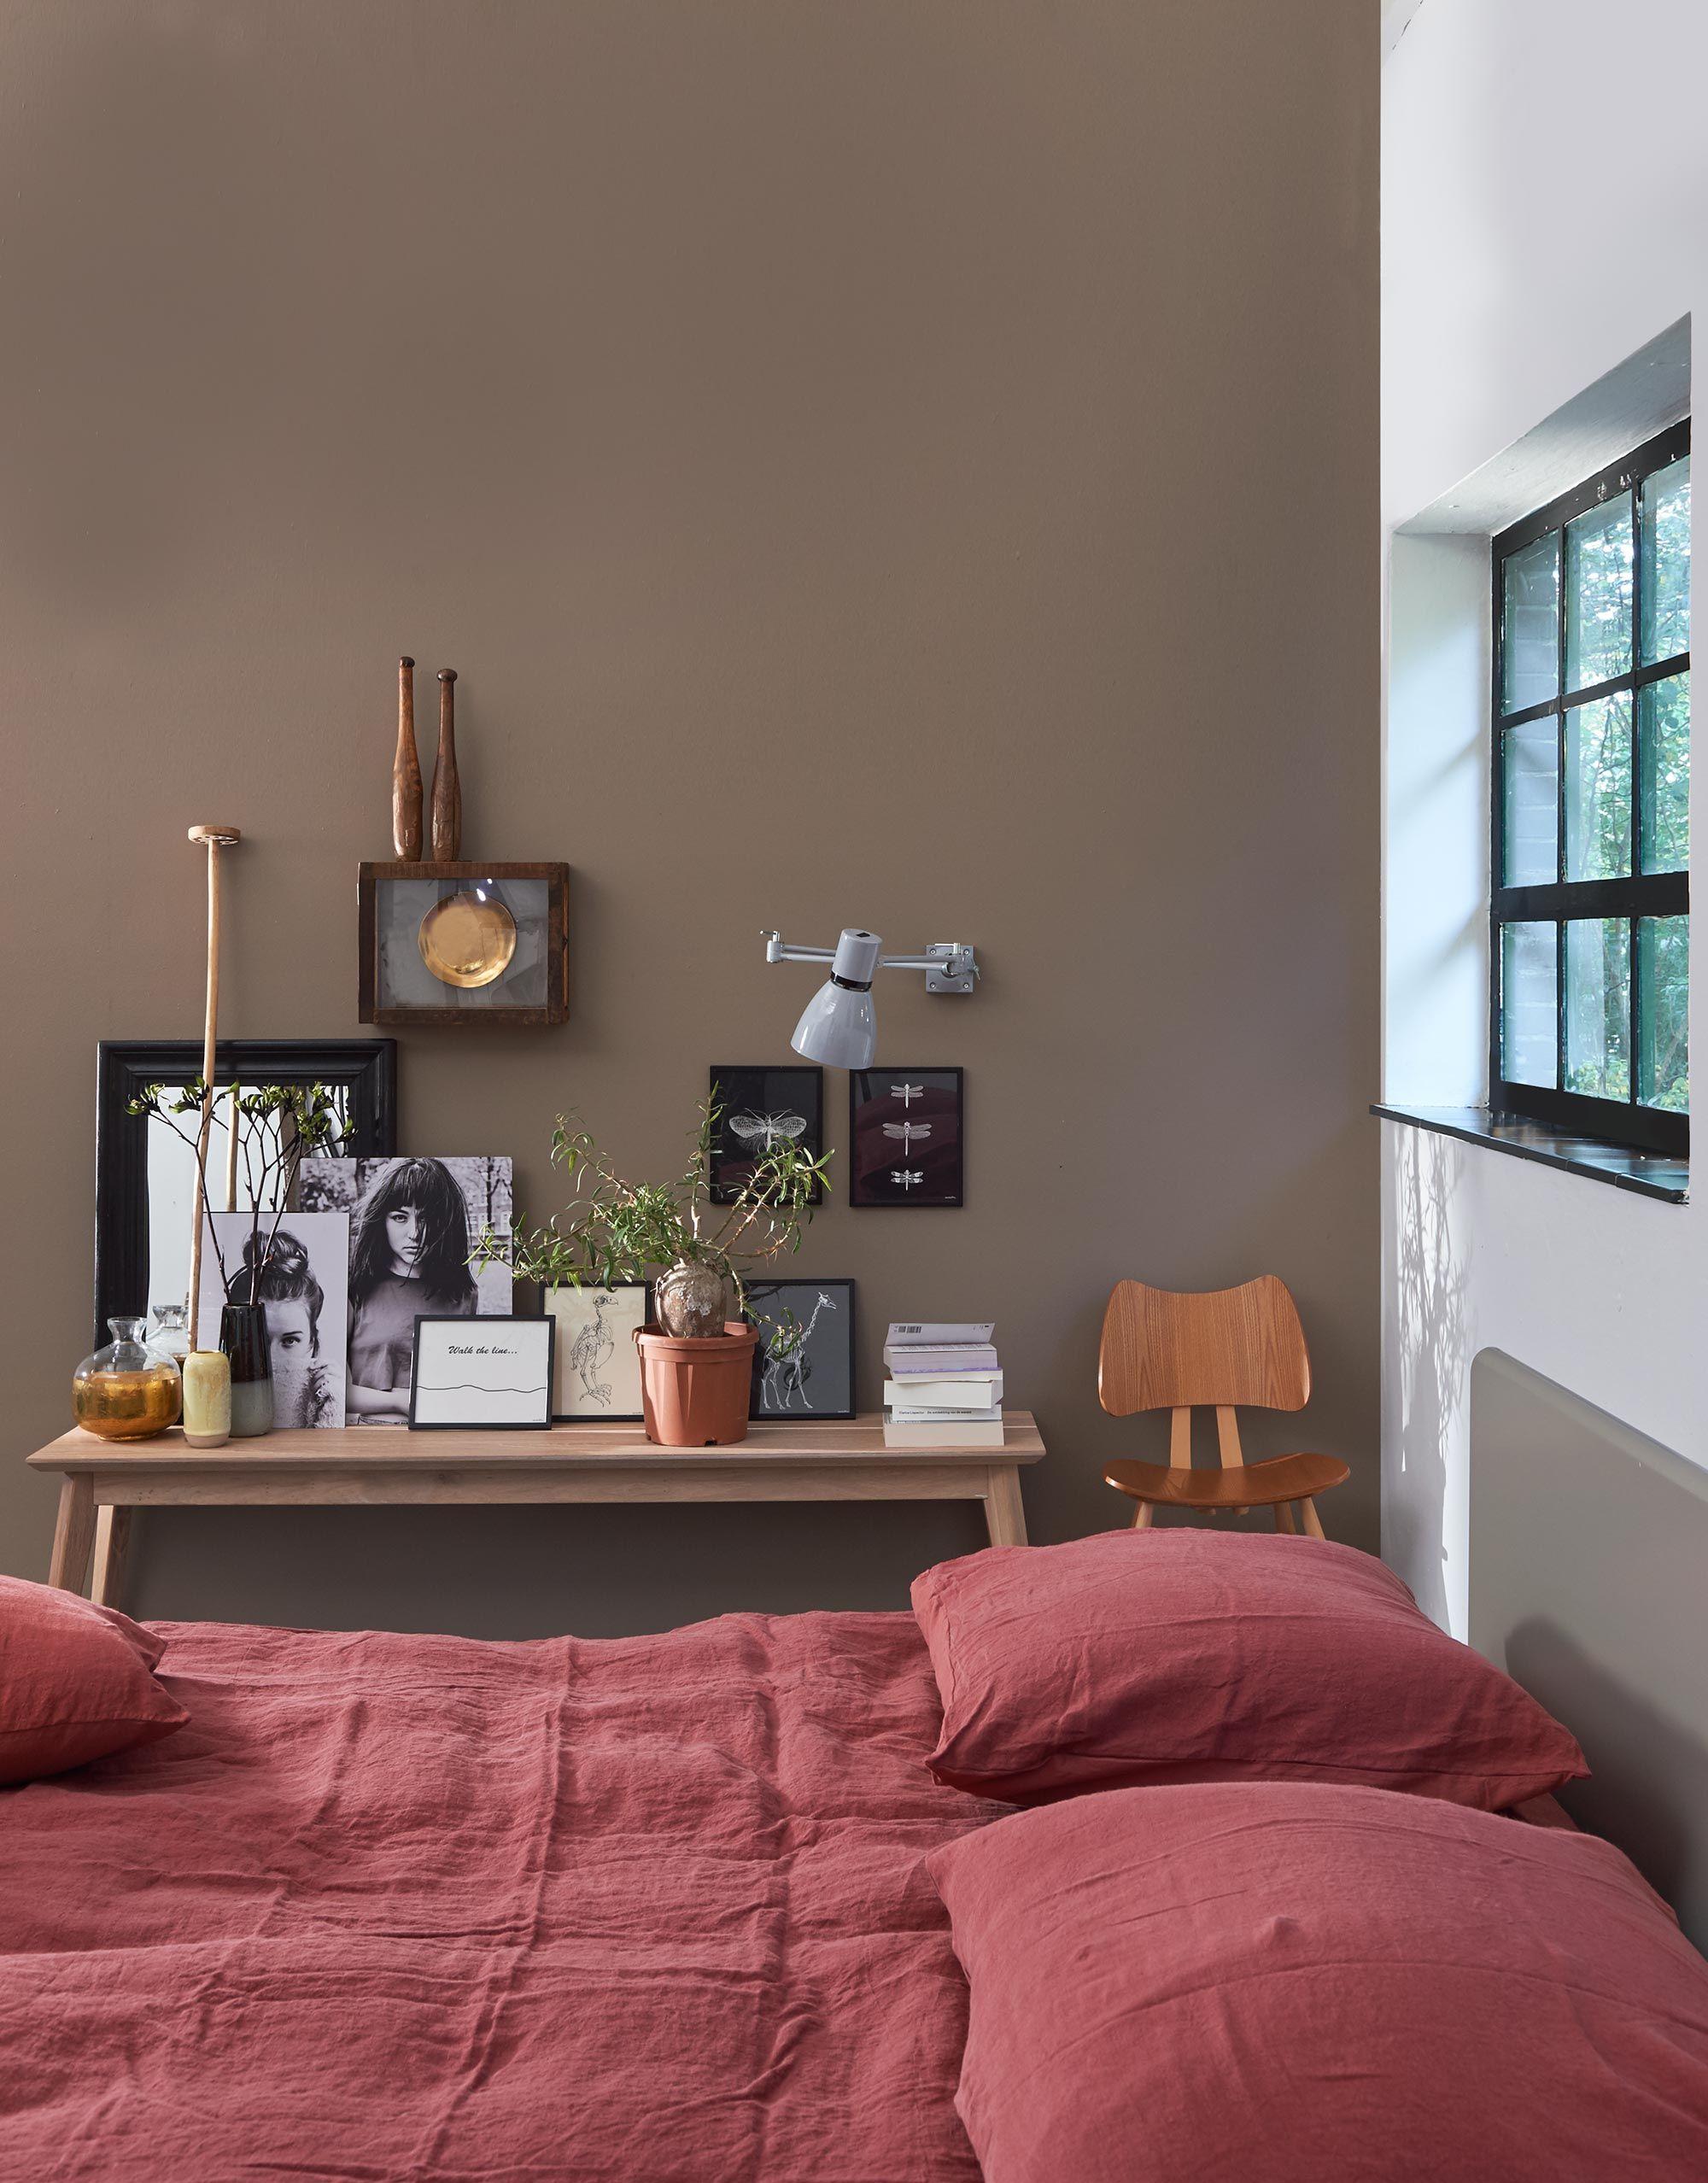 rood beddengoed slaapkamer  red duvetcover bedroom